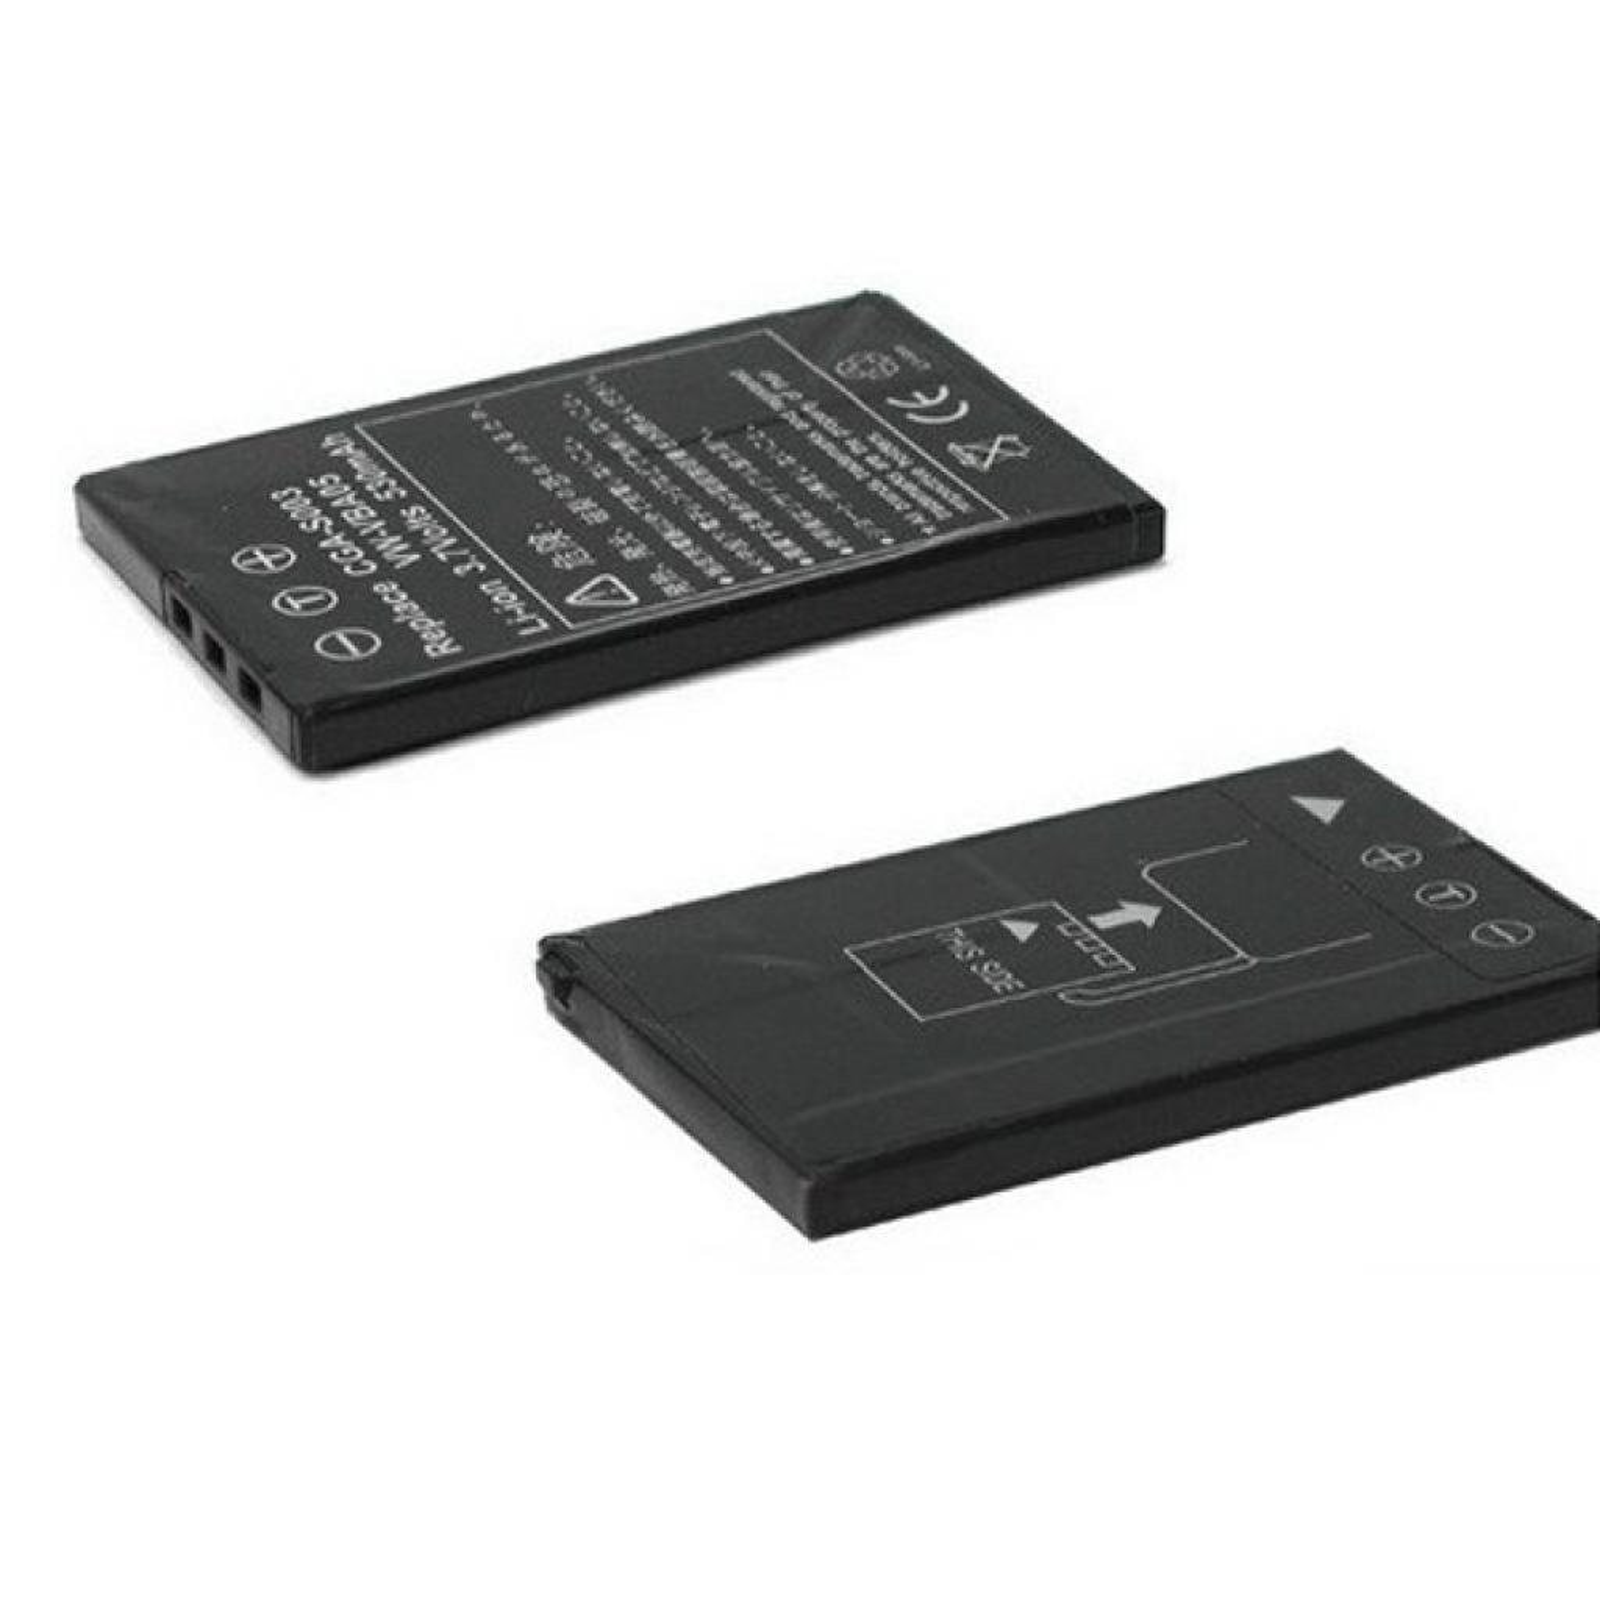 Аккумулятор к фото/видео EXTRADIGITAL Panasonic CGA-S003E, VW-VBA05 (DV00DV1325)